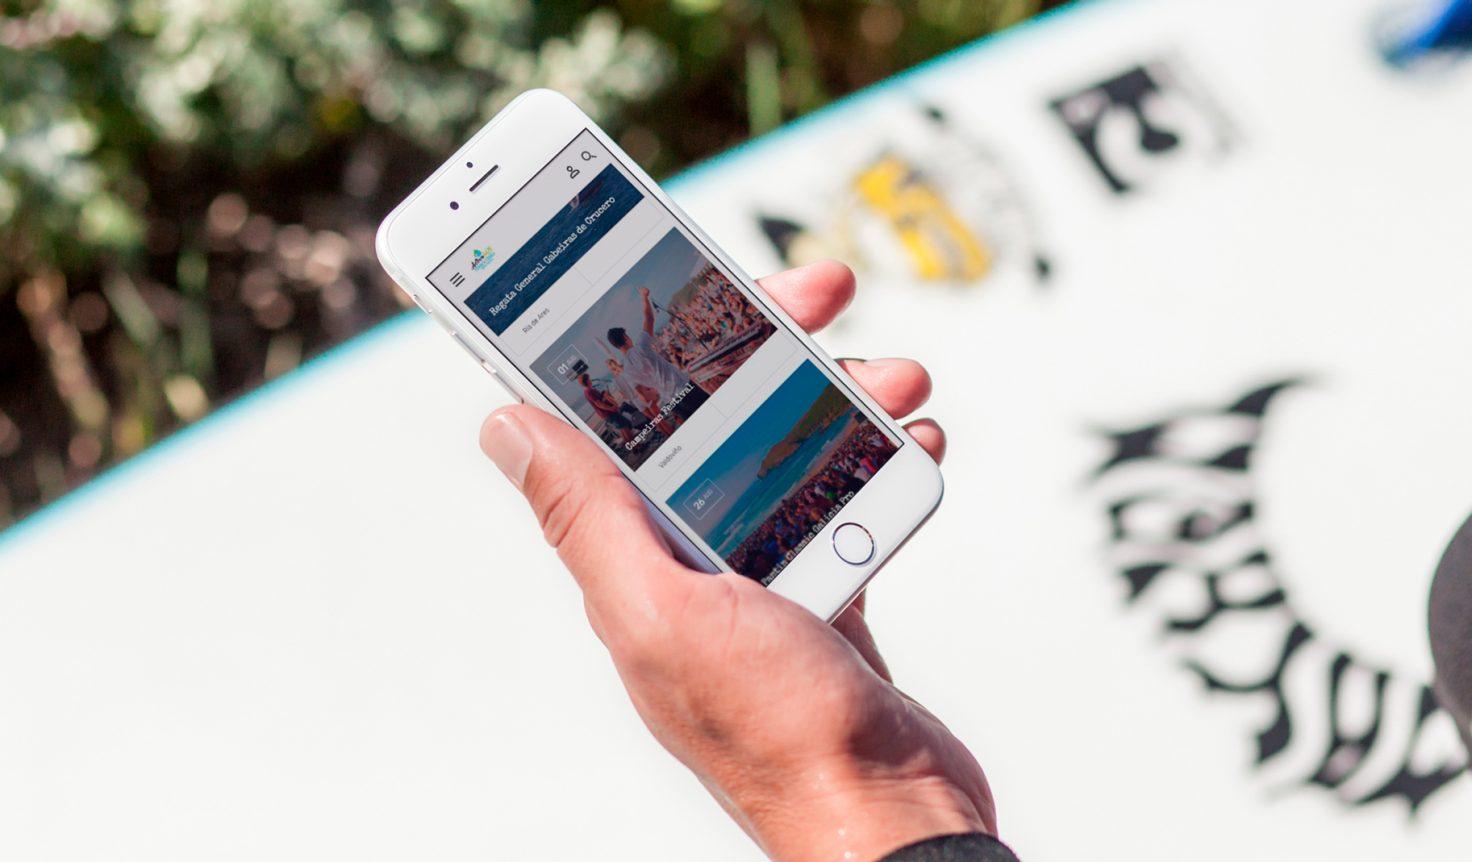 stgo-activo365-app